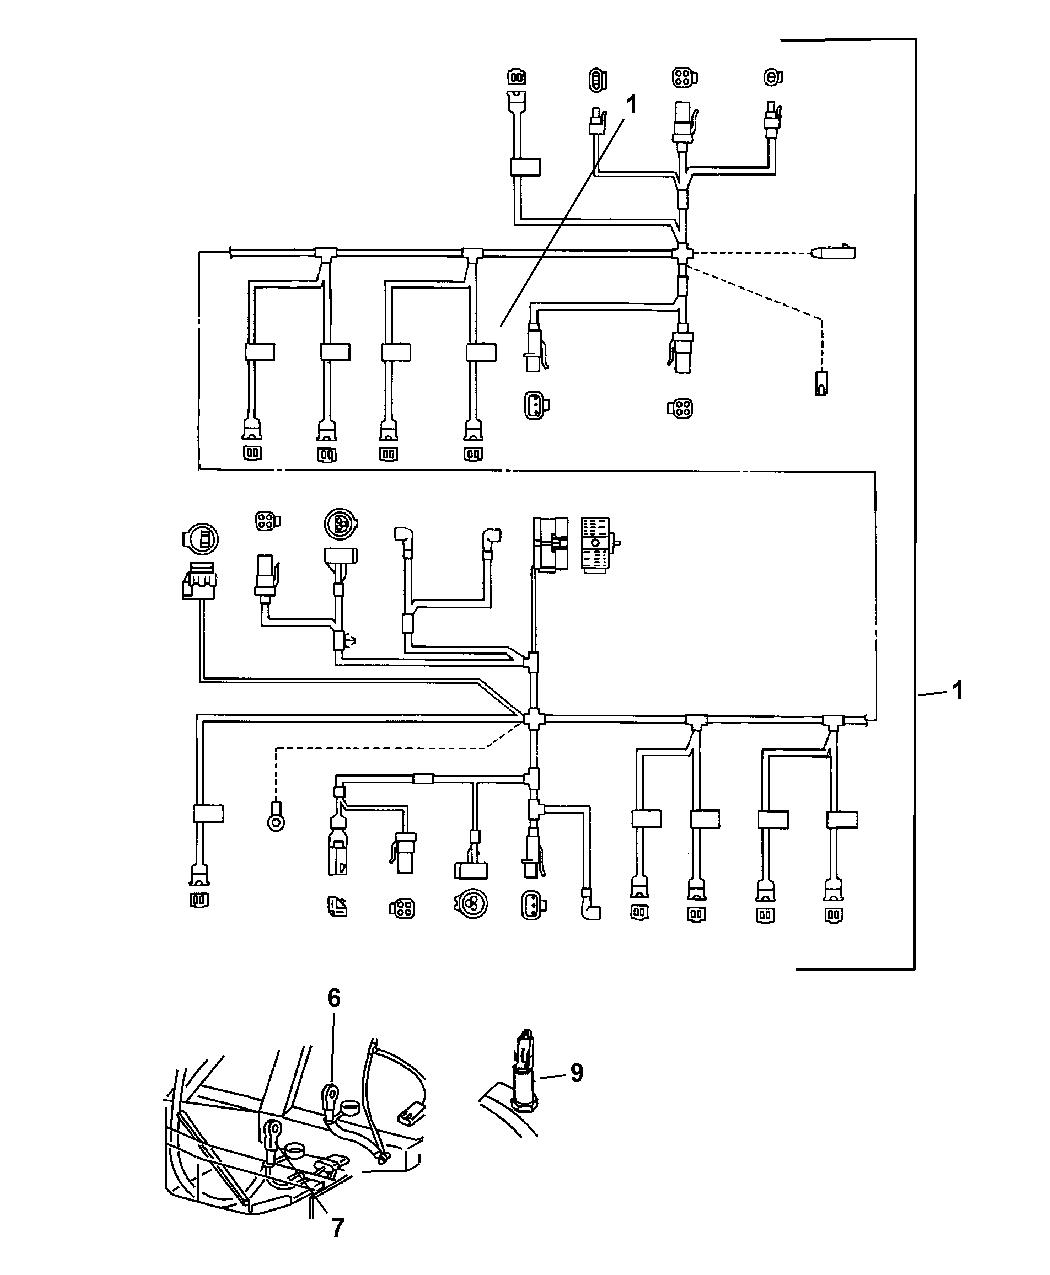 1998 dodge viper wiring engine related mopar parts giant rh moparpartsgiant com